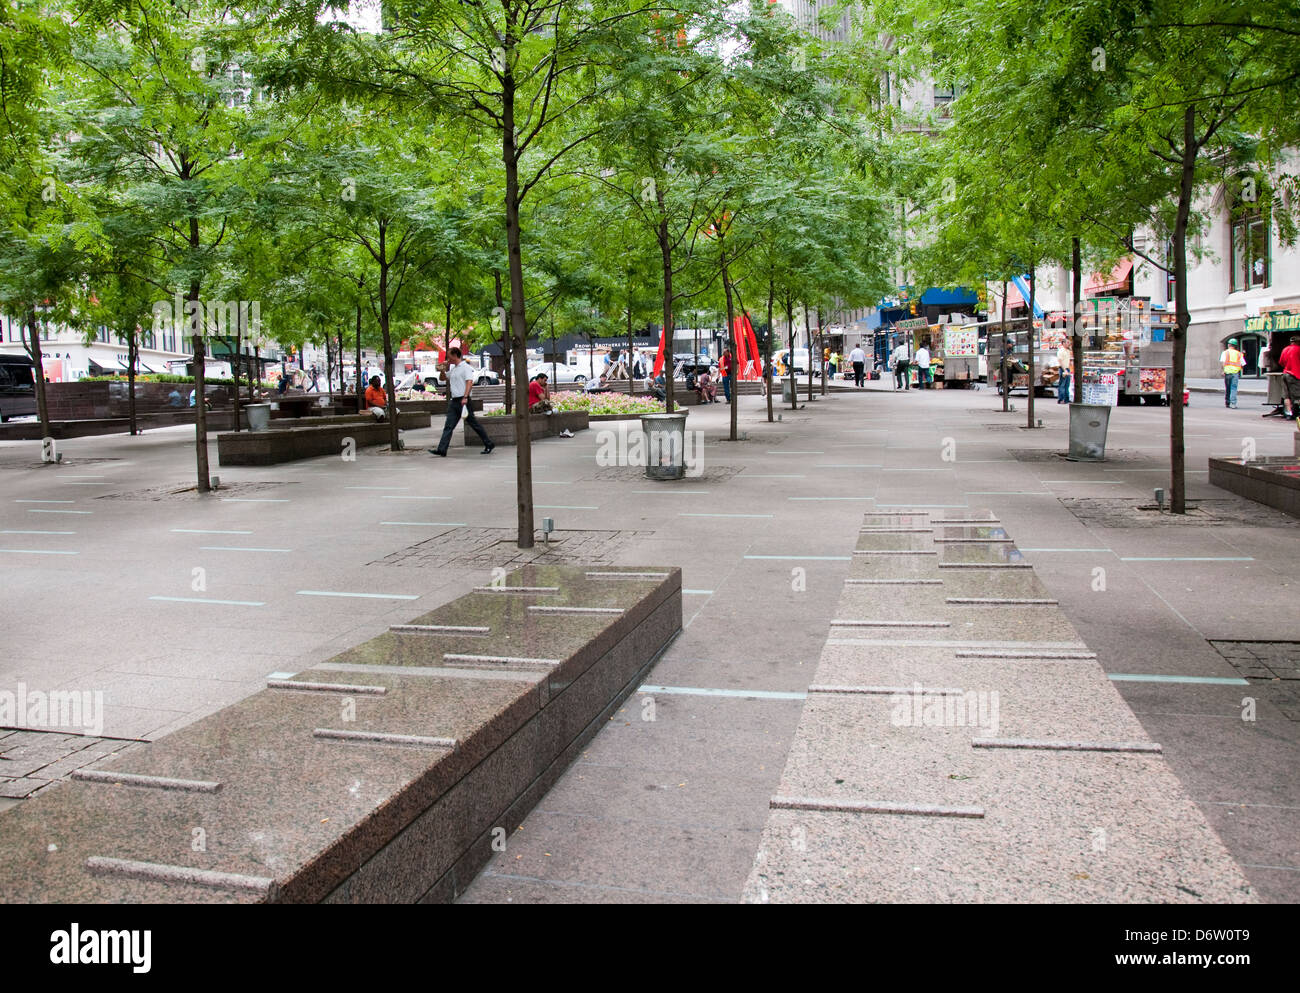 Zuccotti Park in New York City, USA Stock Photo